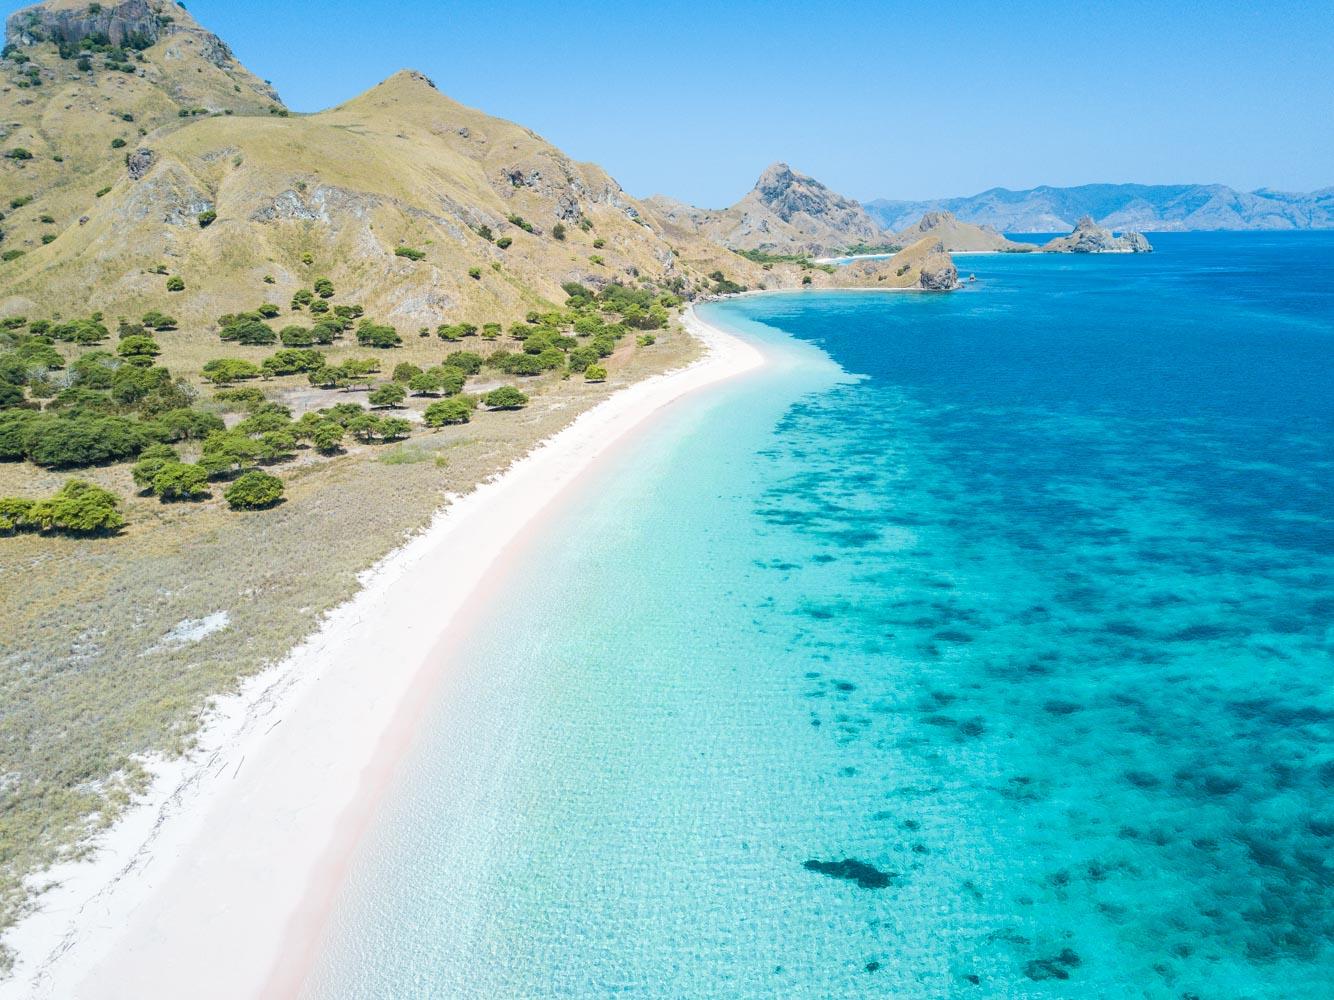 kelana_boat_cruise_pink_ beach.JPG